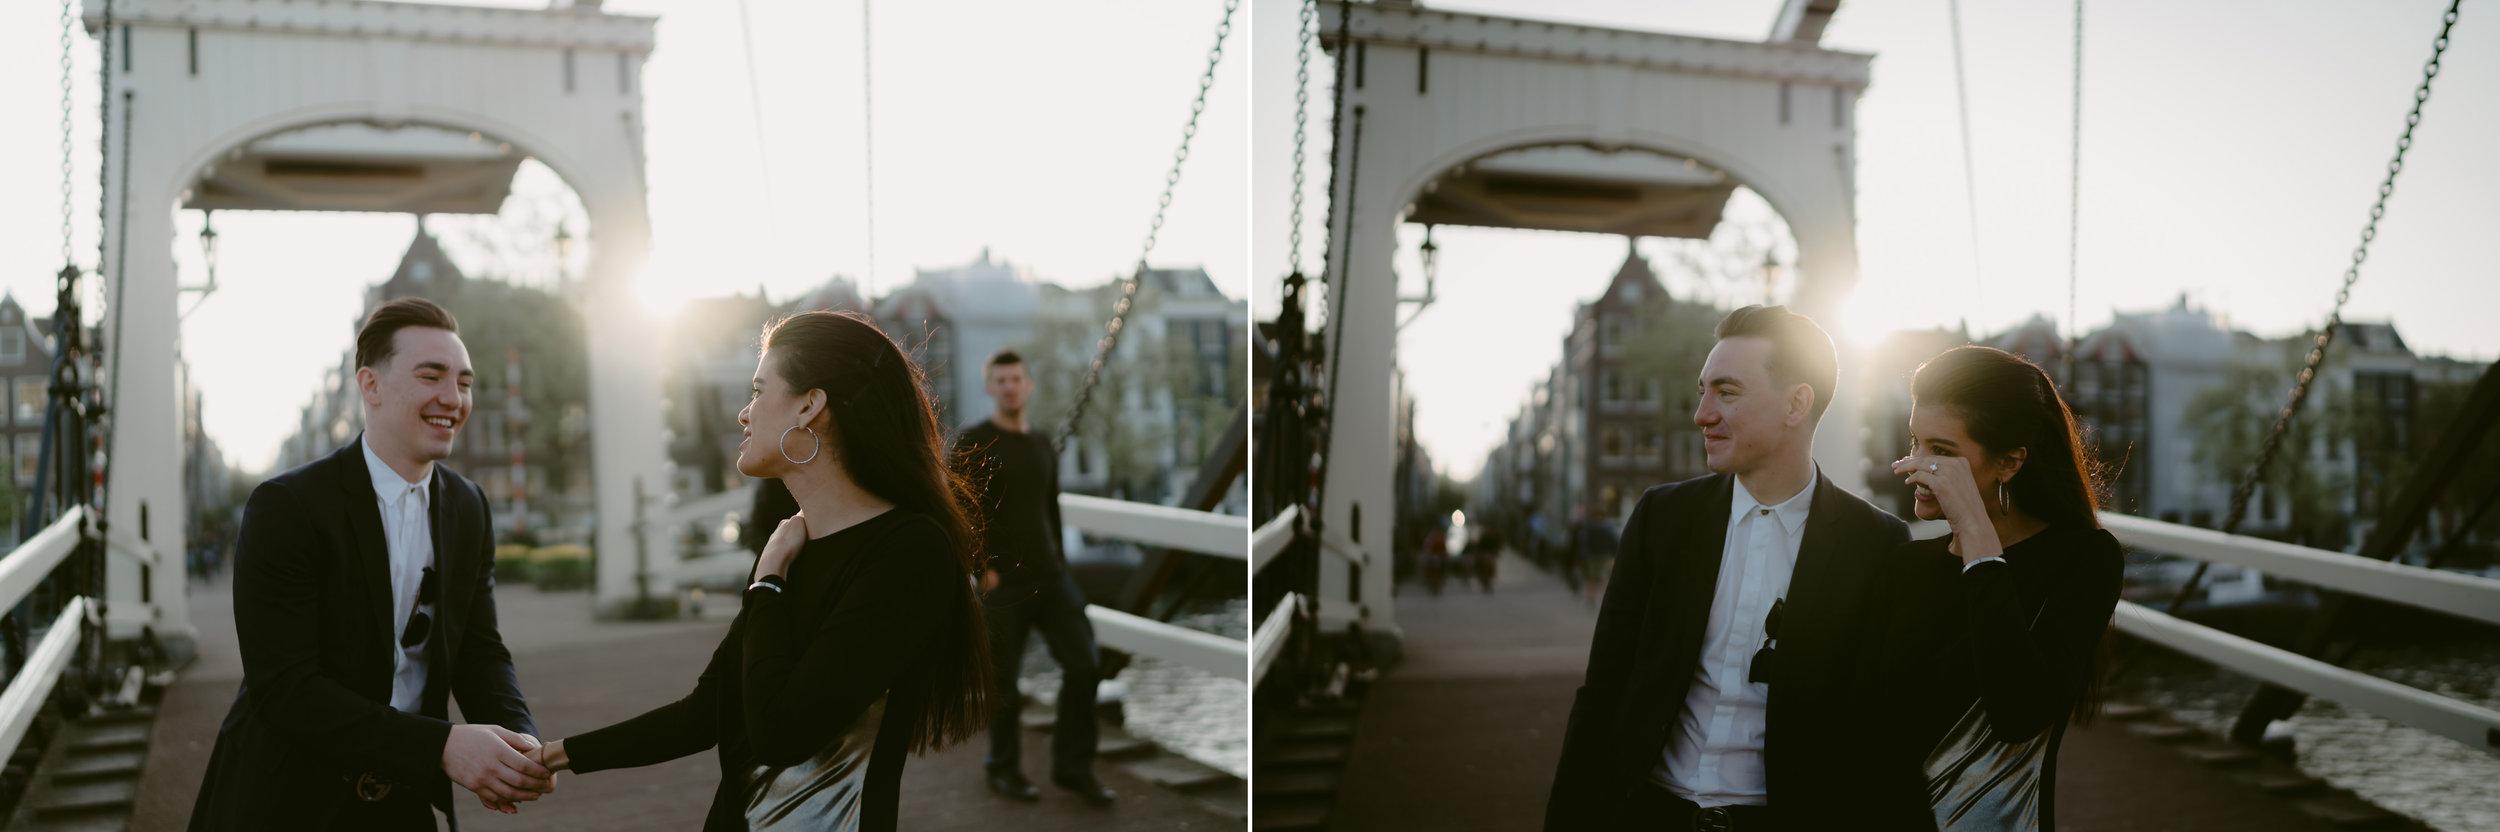 bruidsfotografie amsterdam engagement shoot proposal